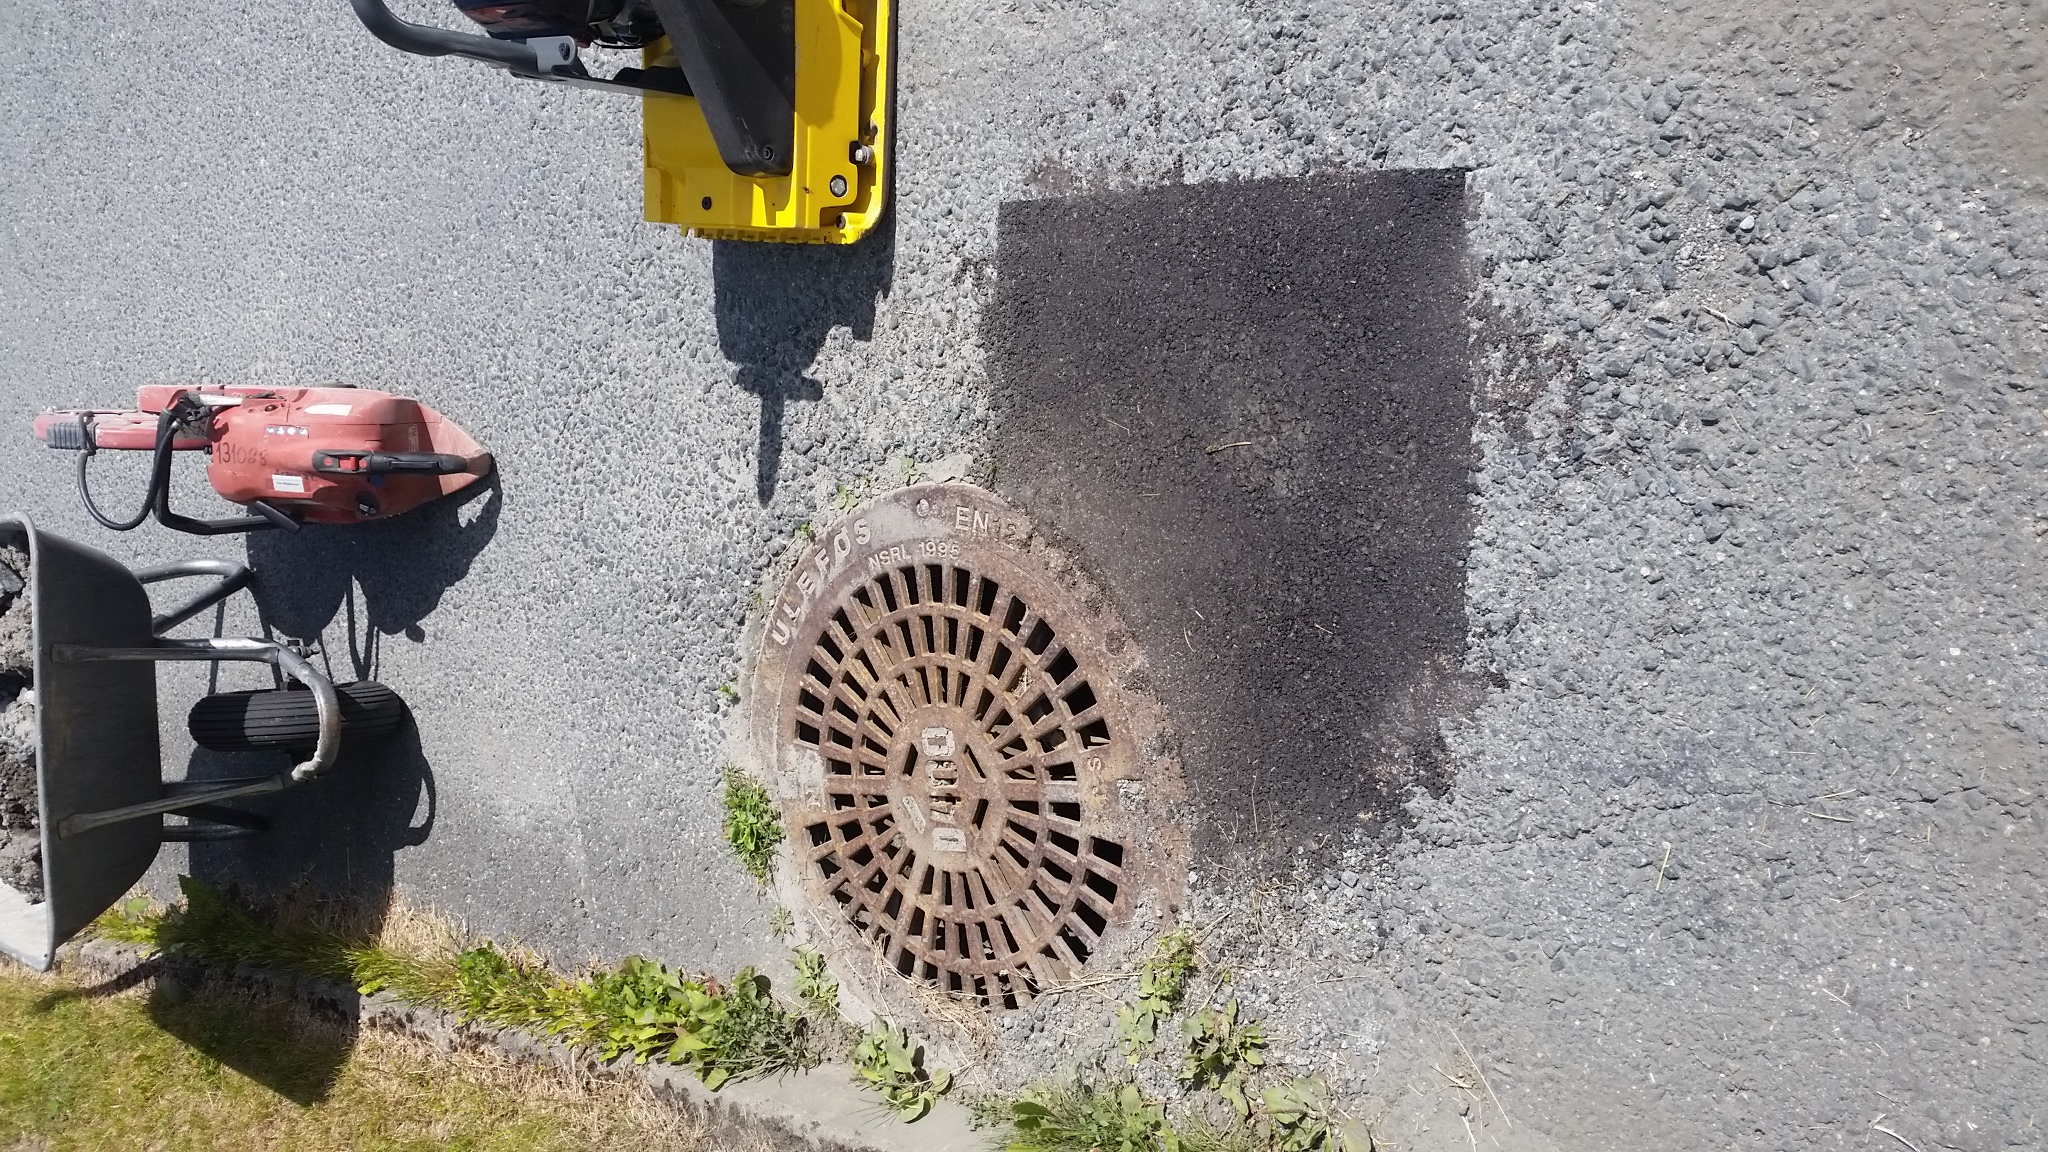 asfalt reparasjon 2